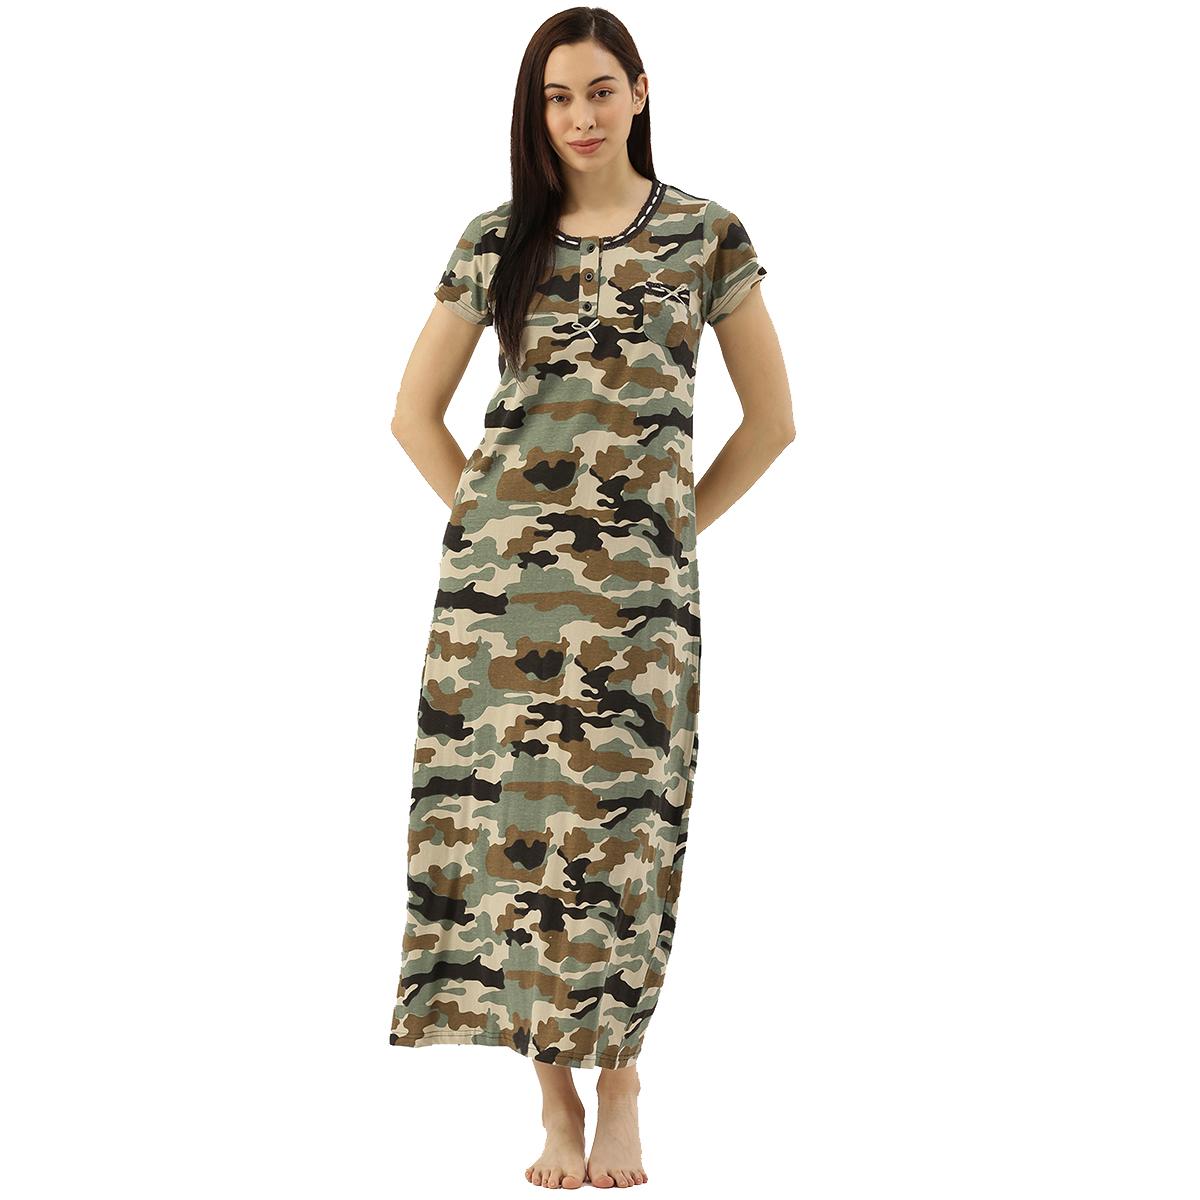 Slumber Jill Kaki Camouflage Night Dress